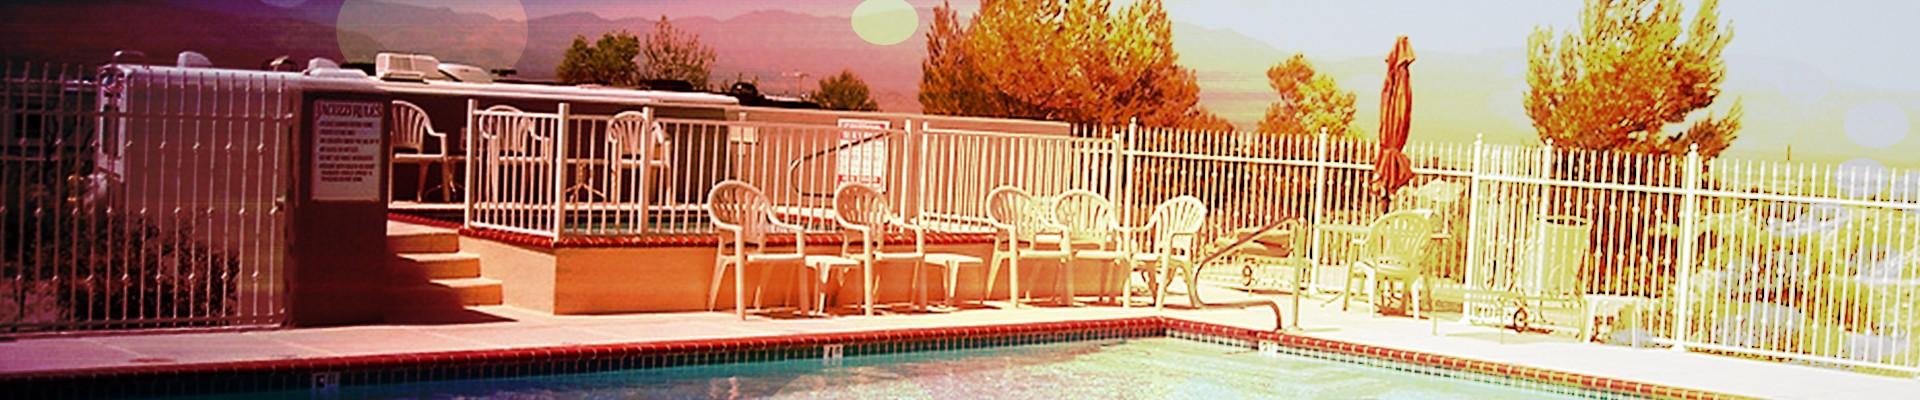 Distant Drums RV Resort in Camp Verde Arizona